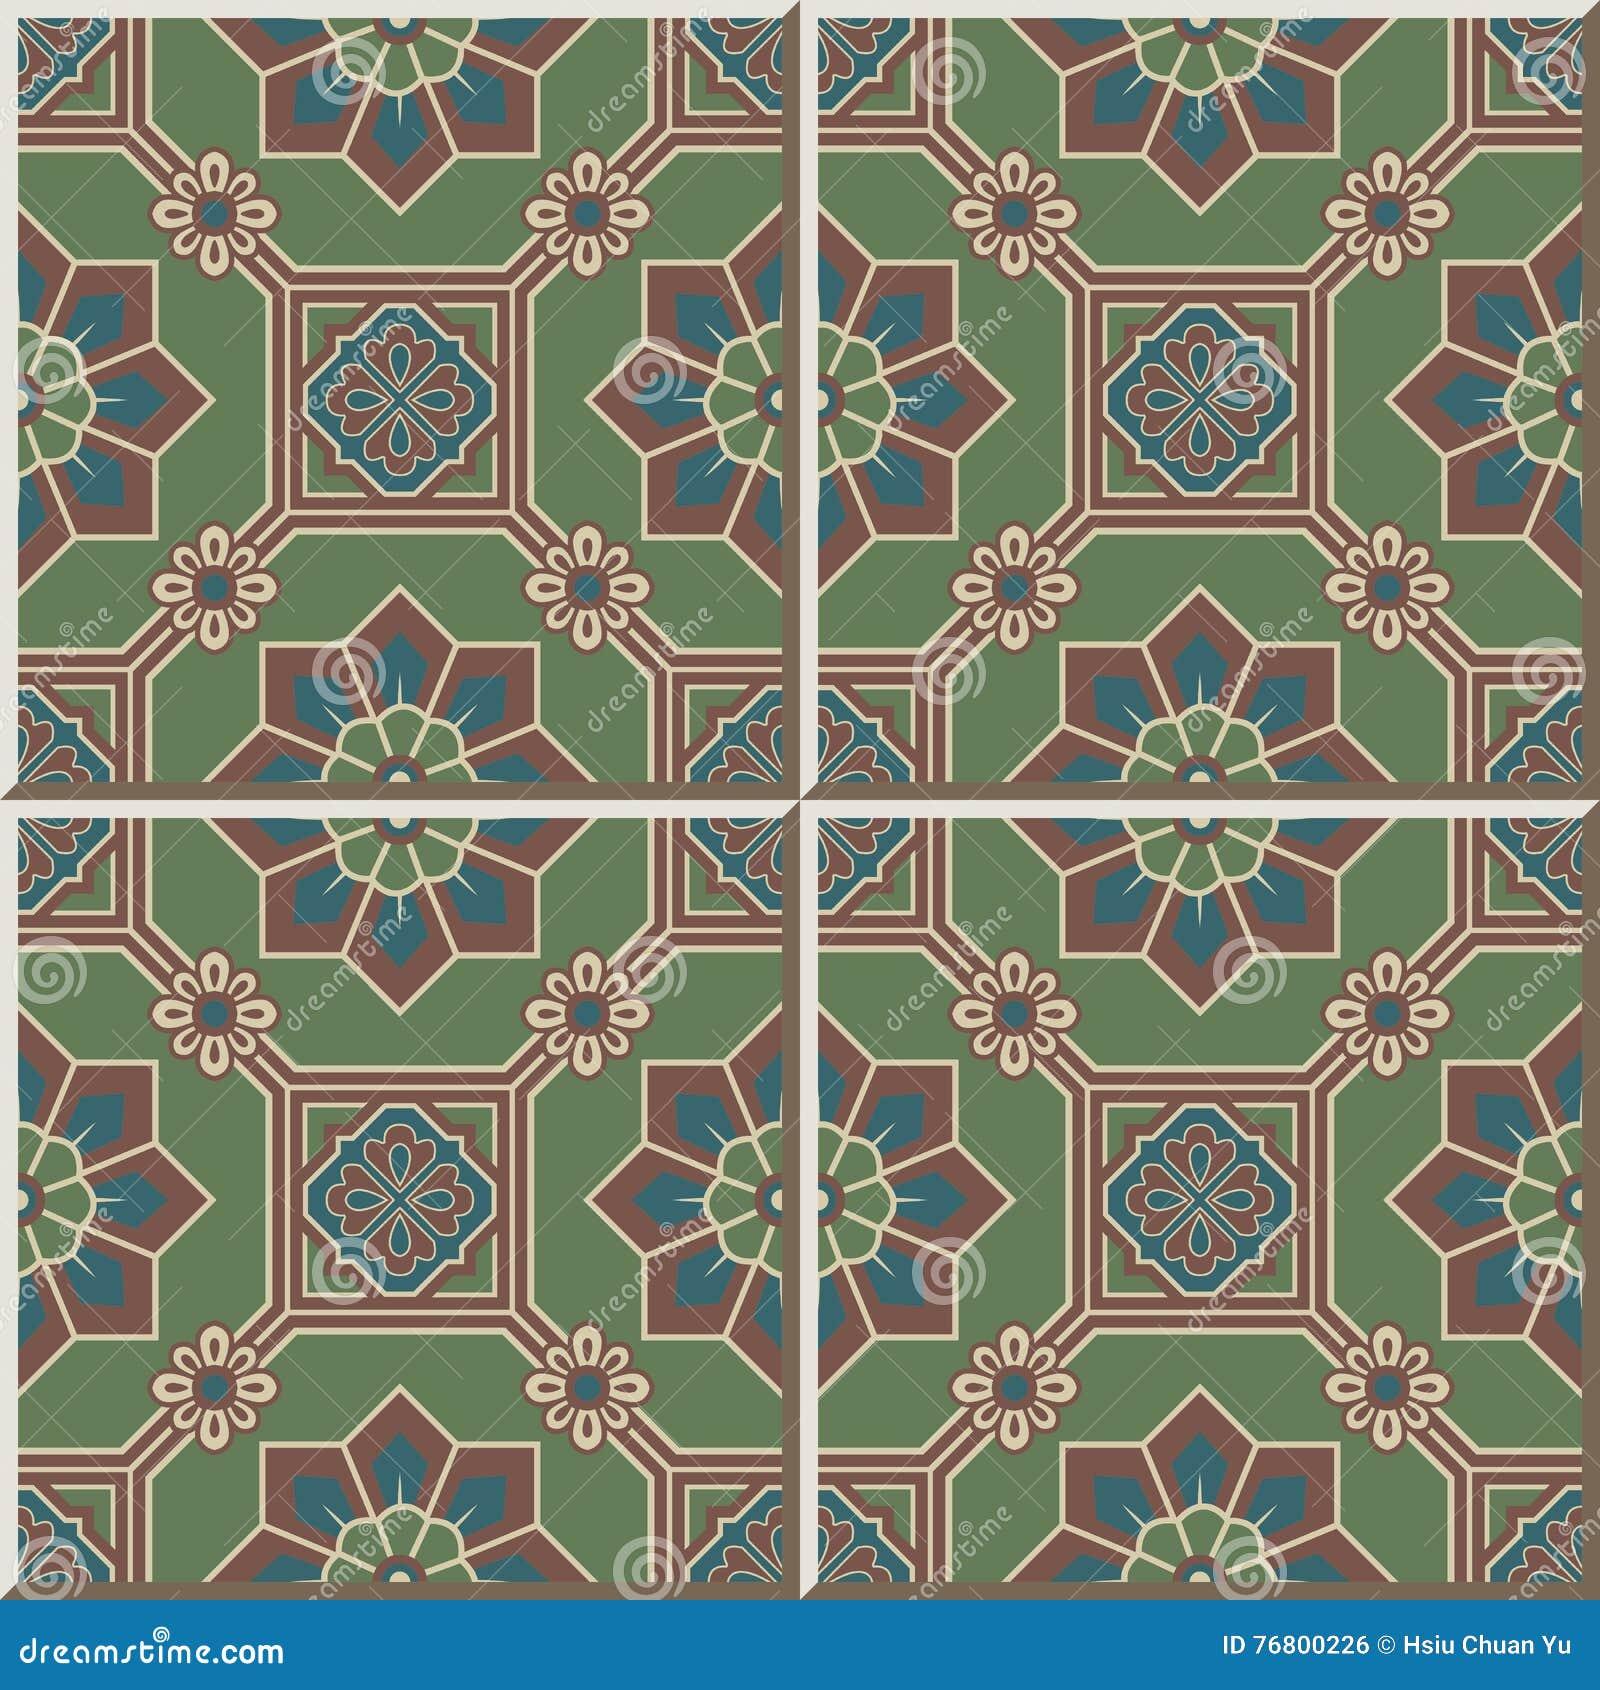 Ceramic Tile Pattern 414 Oriental Octagon Square Frame Cross Flower